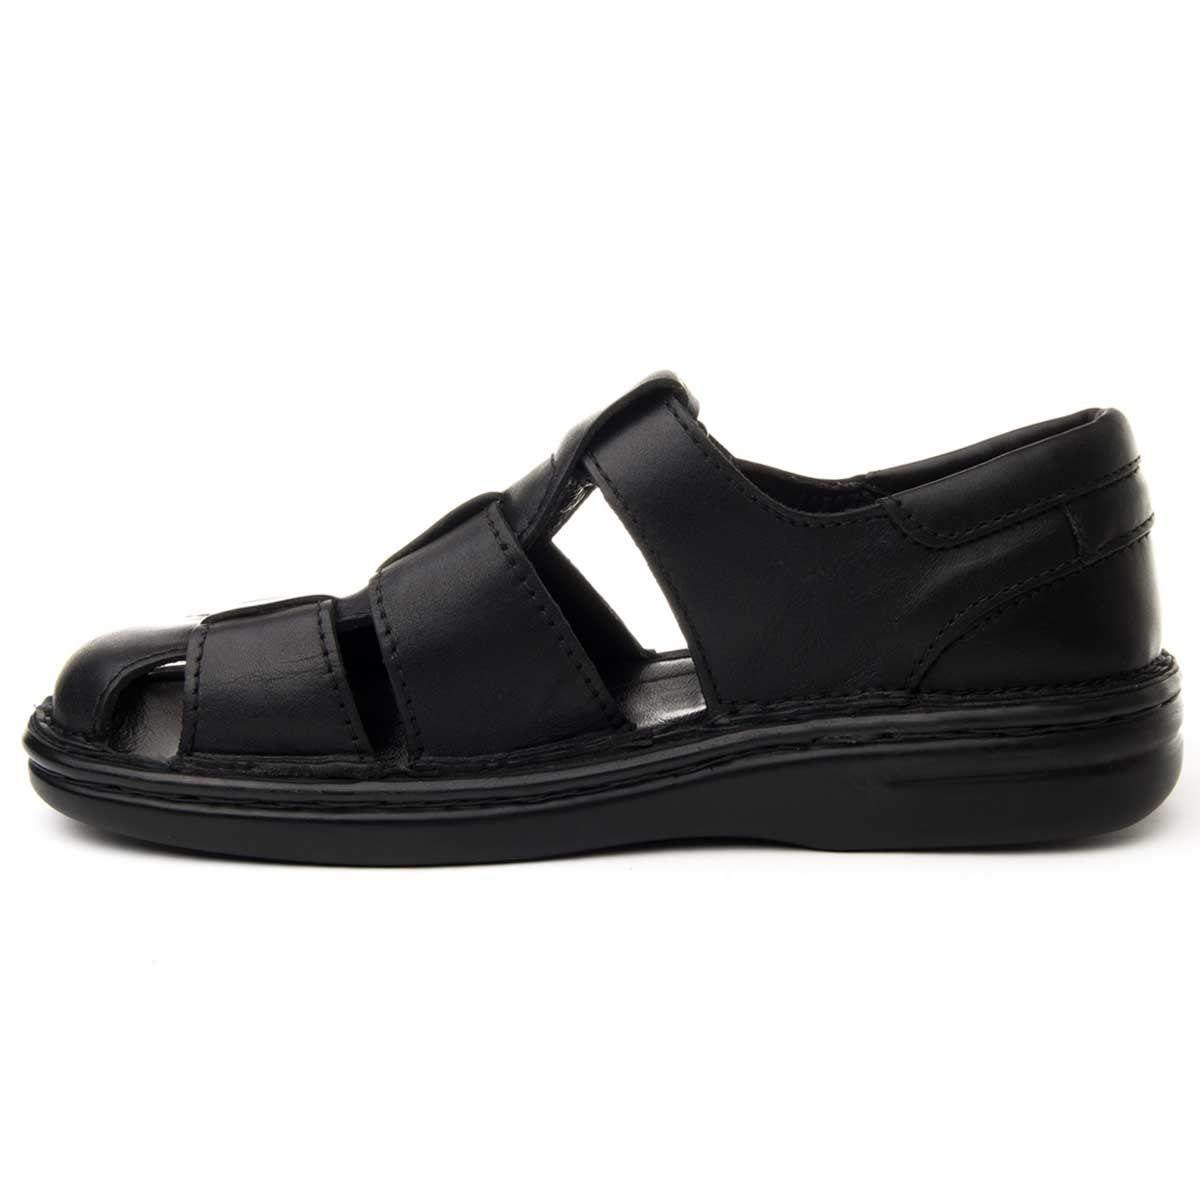 Montevita Flat Leather Sandal in Black